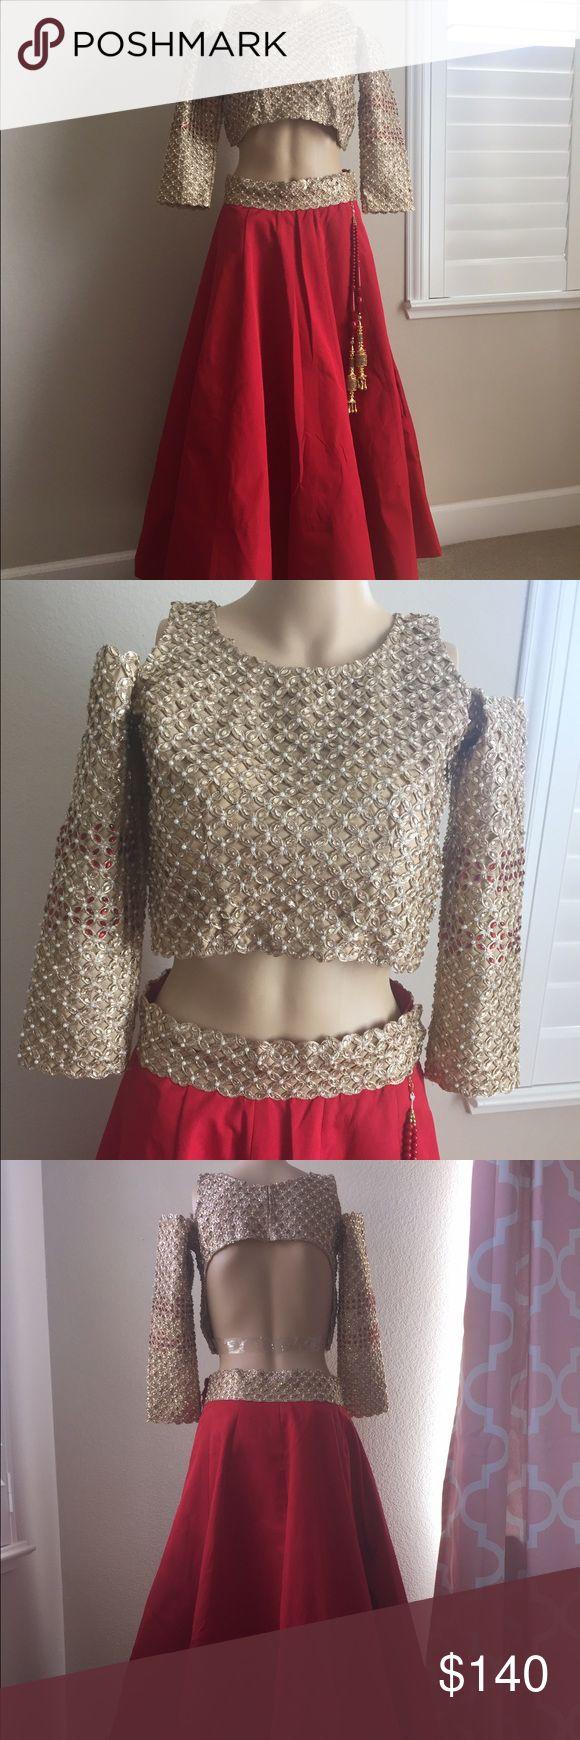 "Indian Pakistani party wear dress Bust:- 31 1/2"", Length:- 14"" waist :- 27"" sleeve:- 16"".  Skirt is 40"" length waist is 30"" Dresses Wedding"